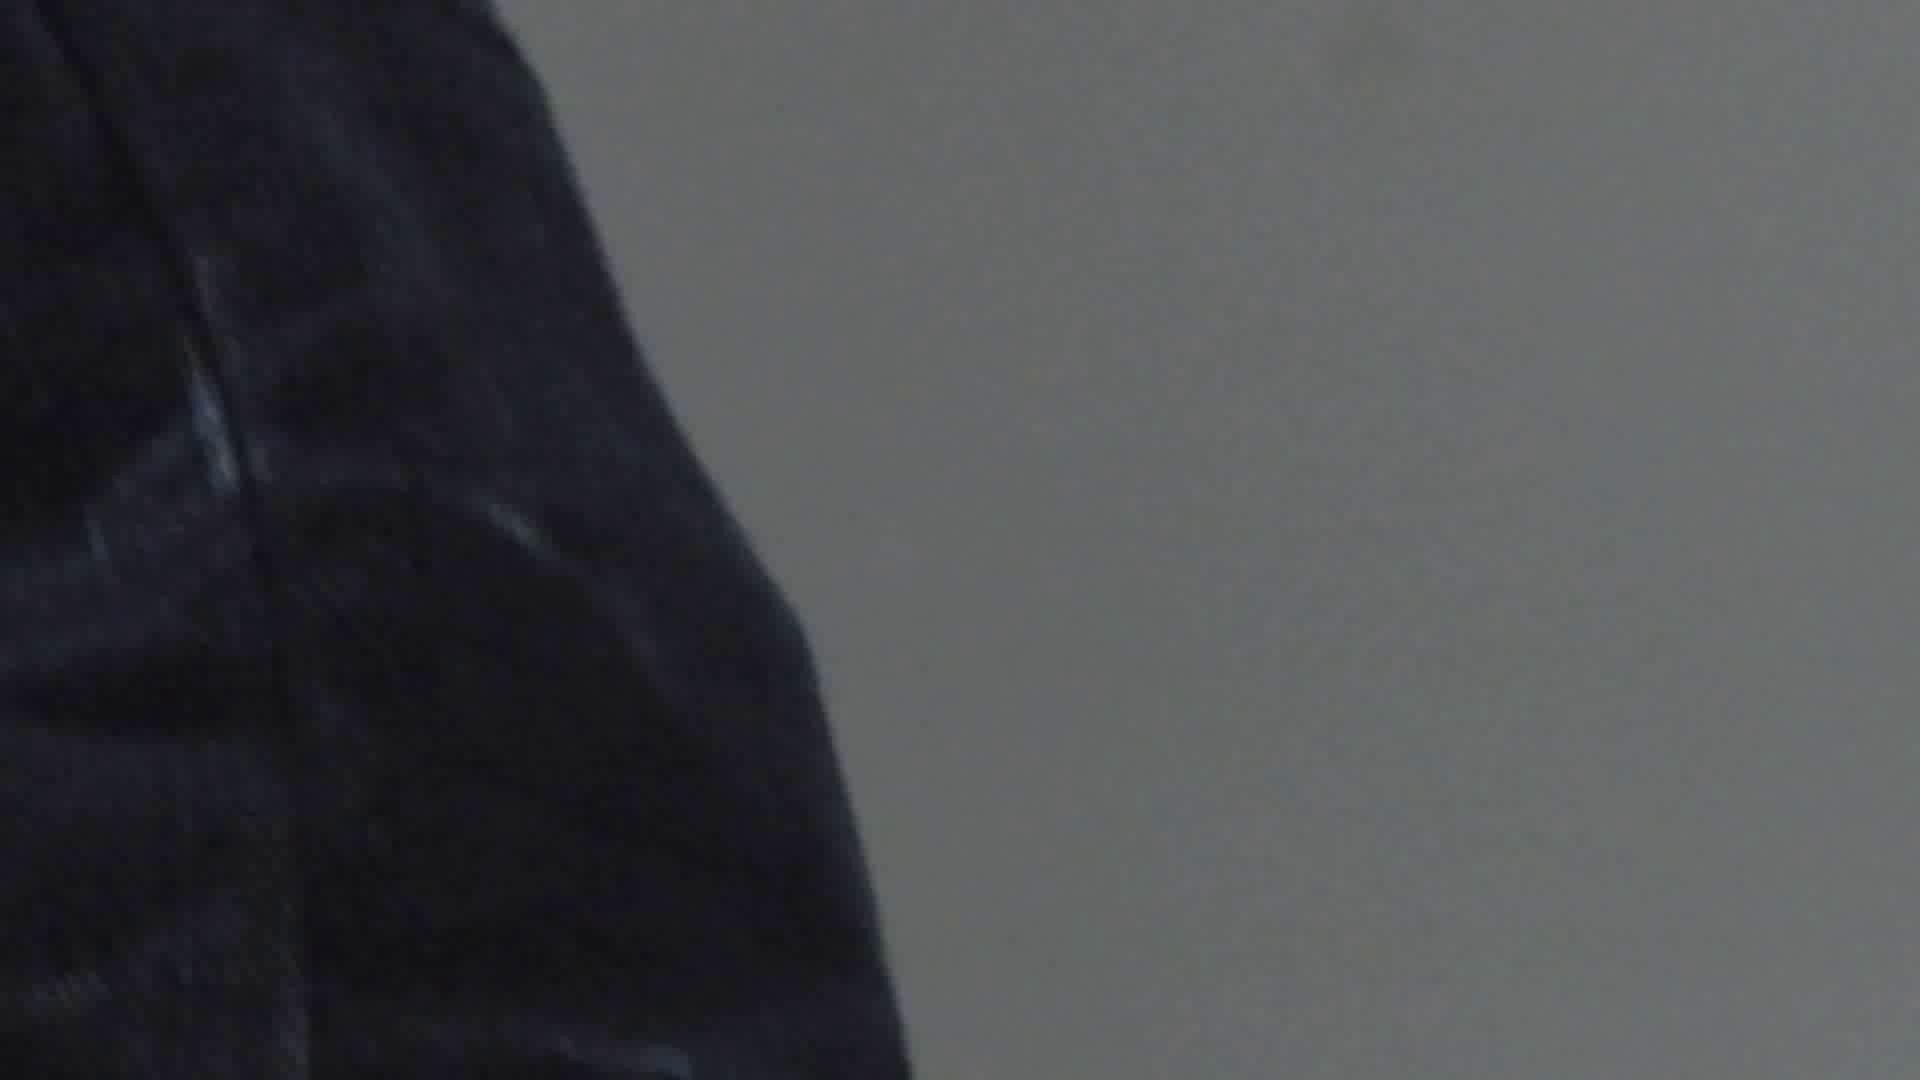 vol.25三十時間潜り、一つしか出会えない完璧桃尻編 byお銀 美人  96pic 27